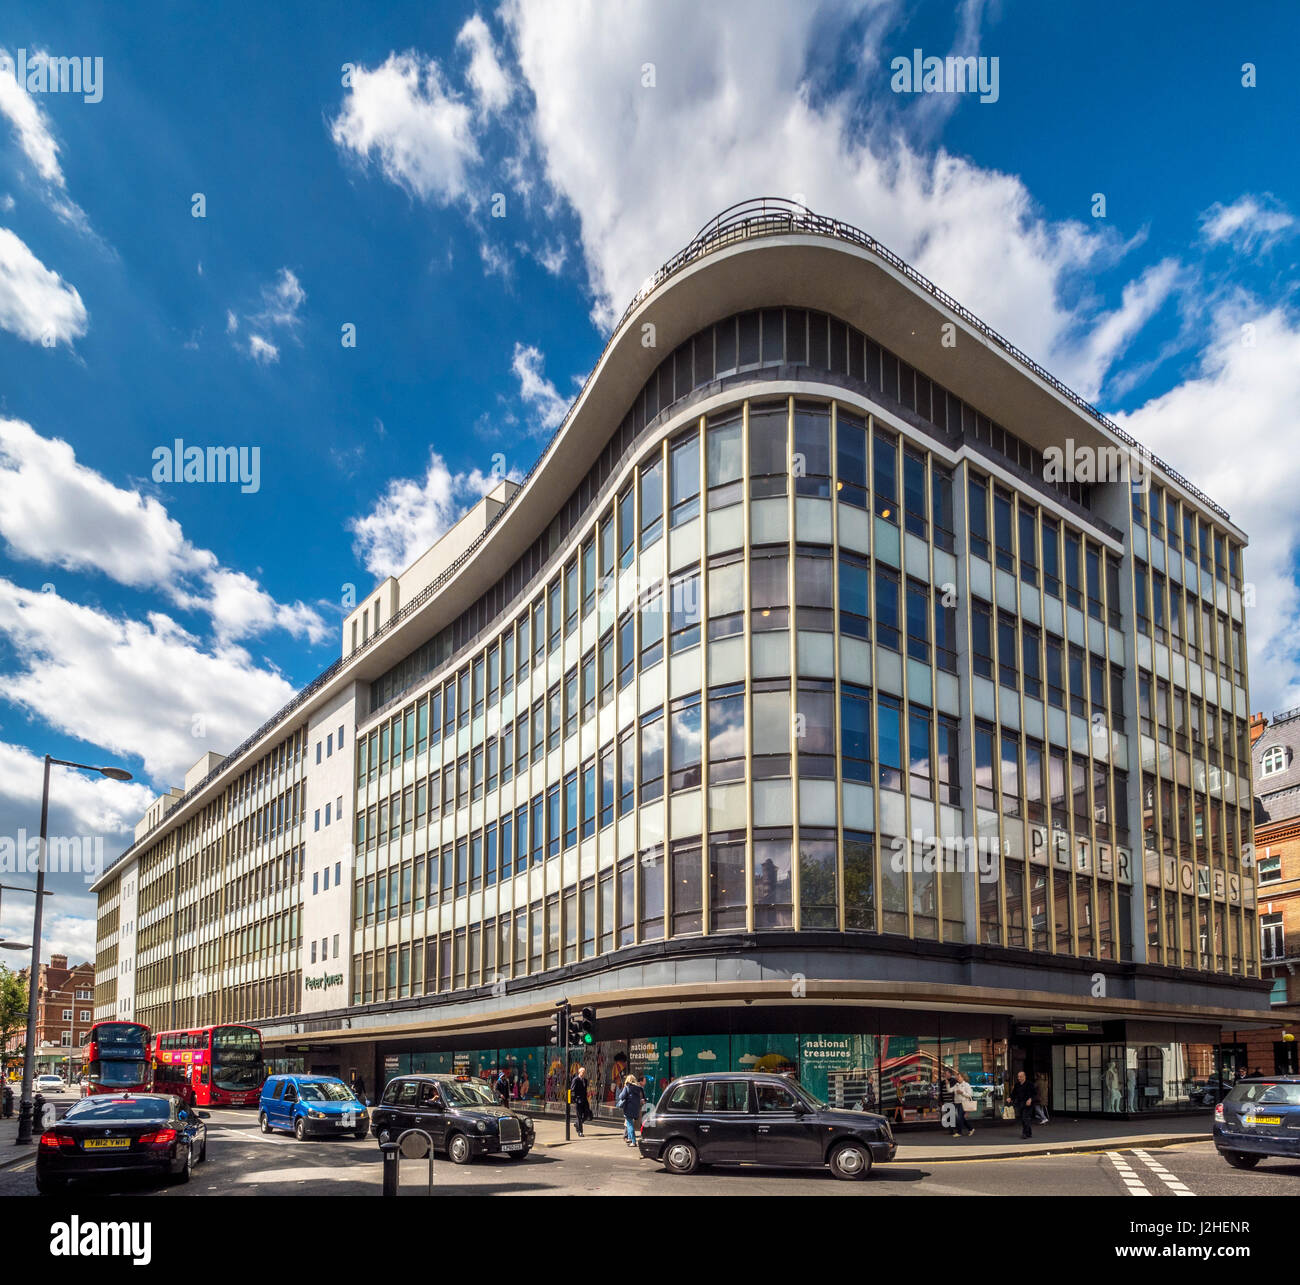 Peter Jones Department store, Sloane Square, London, UK. - Stock Image